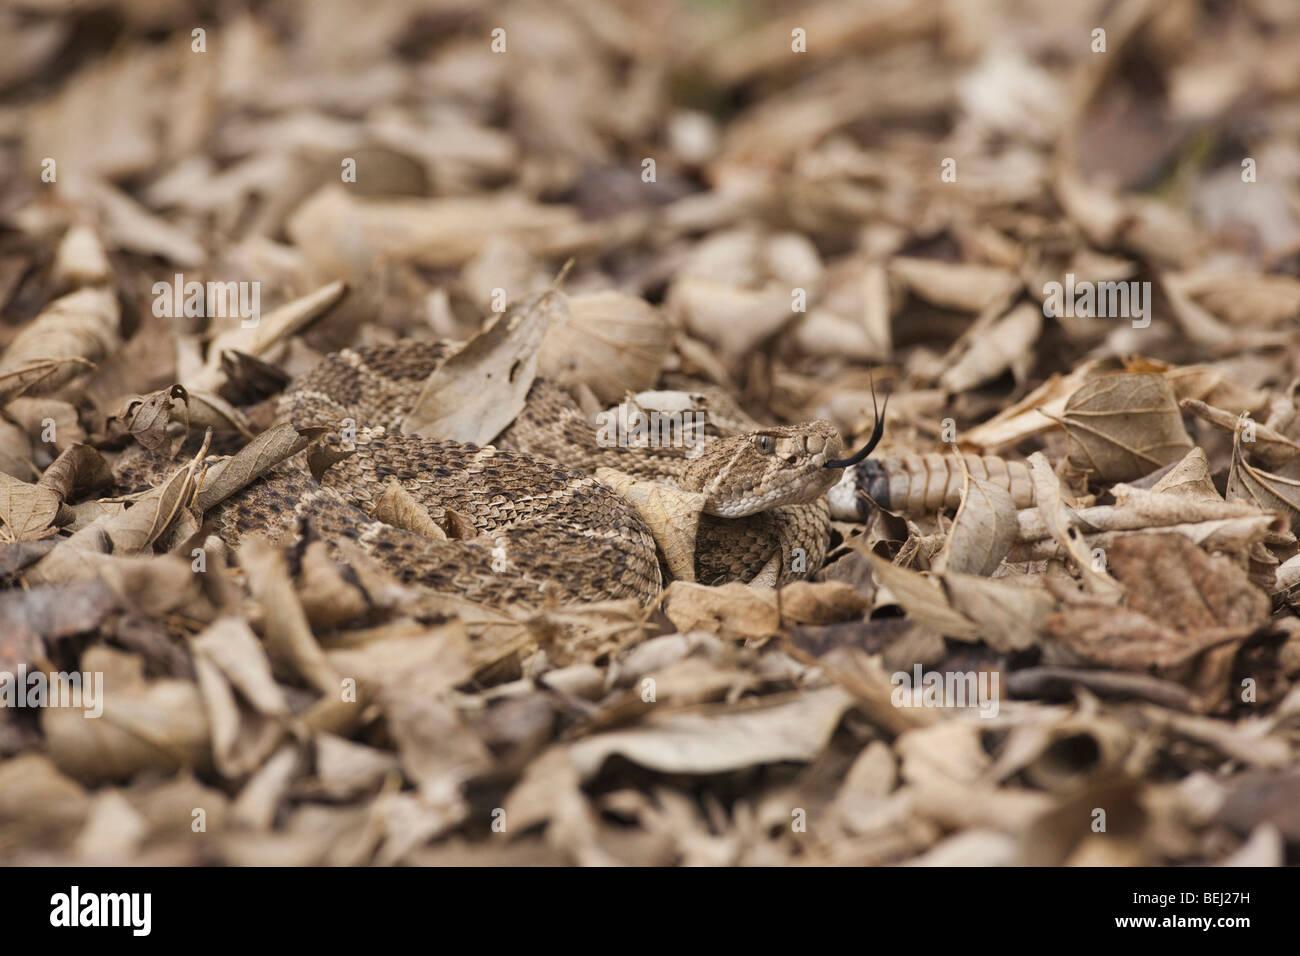 Western Diamondback Klapperschlange (Crotalus Atrox), Erwachsene getarnt in Laubstreu, Sinton, Fronleichnam, Coastal Stockbild